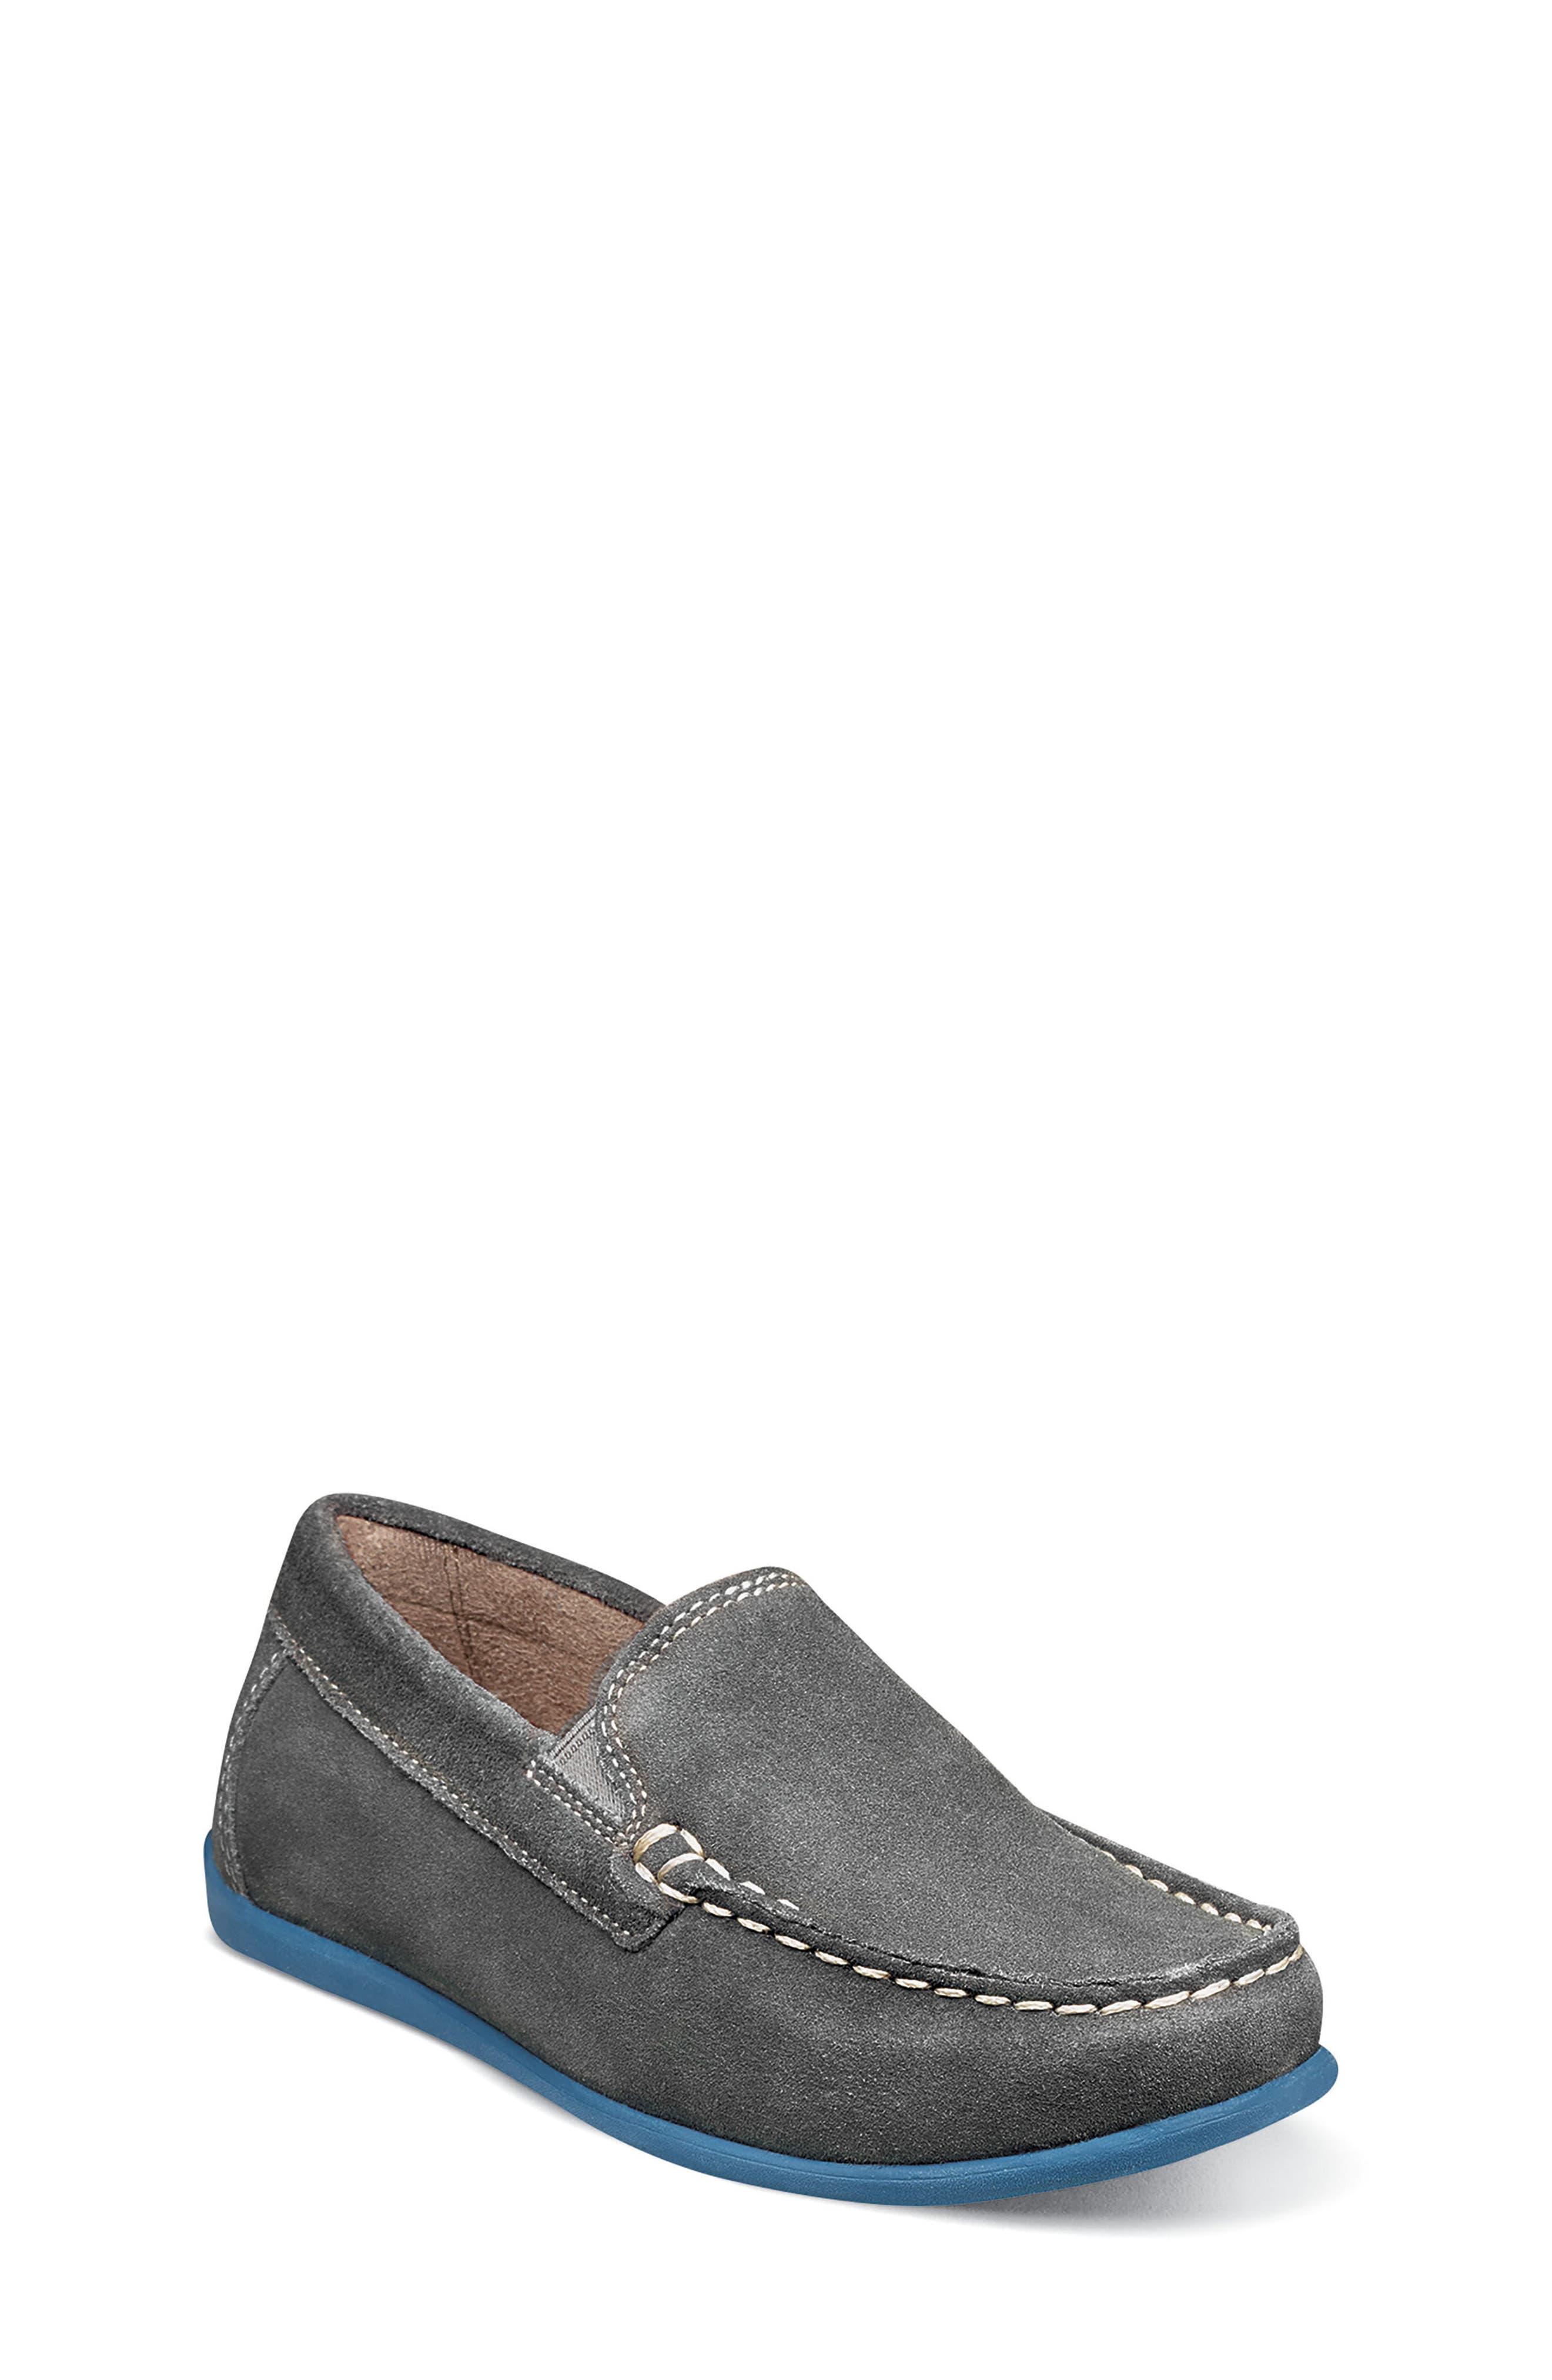 Boys Florsheim Jasper  Venetian Jr Loafer Size 1 M  Grey